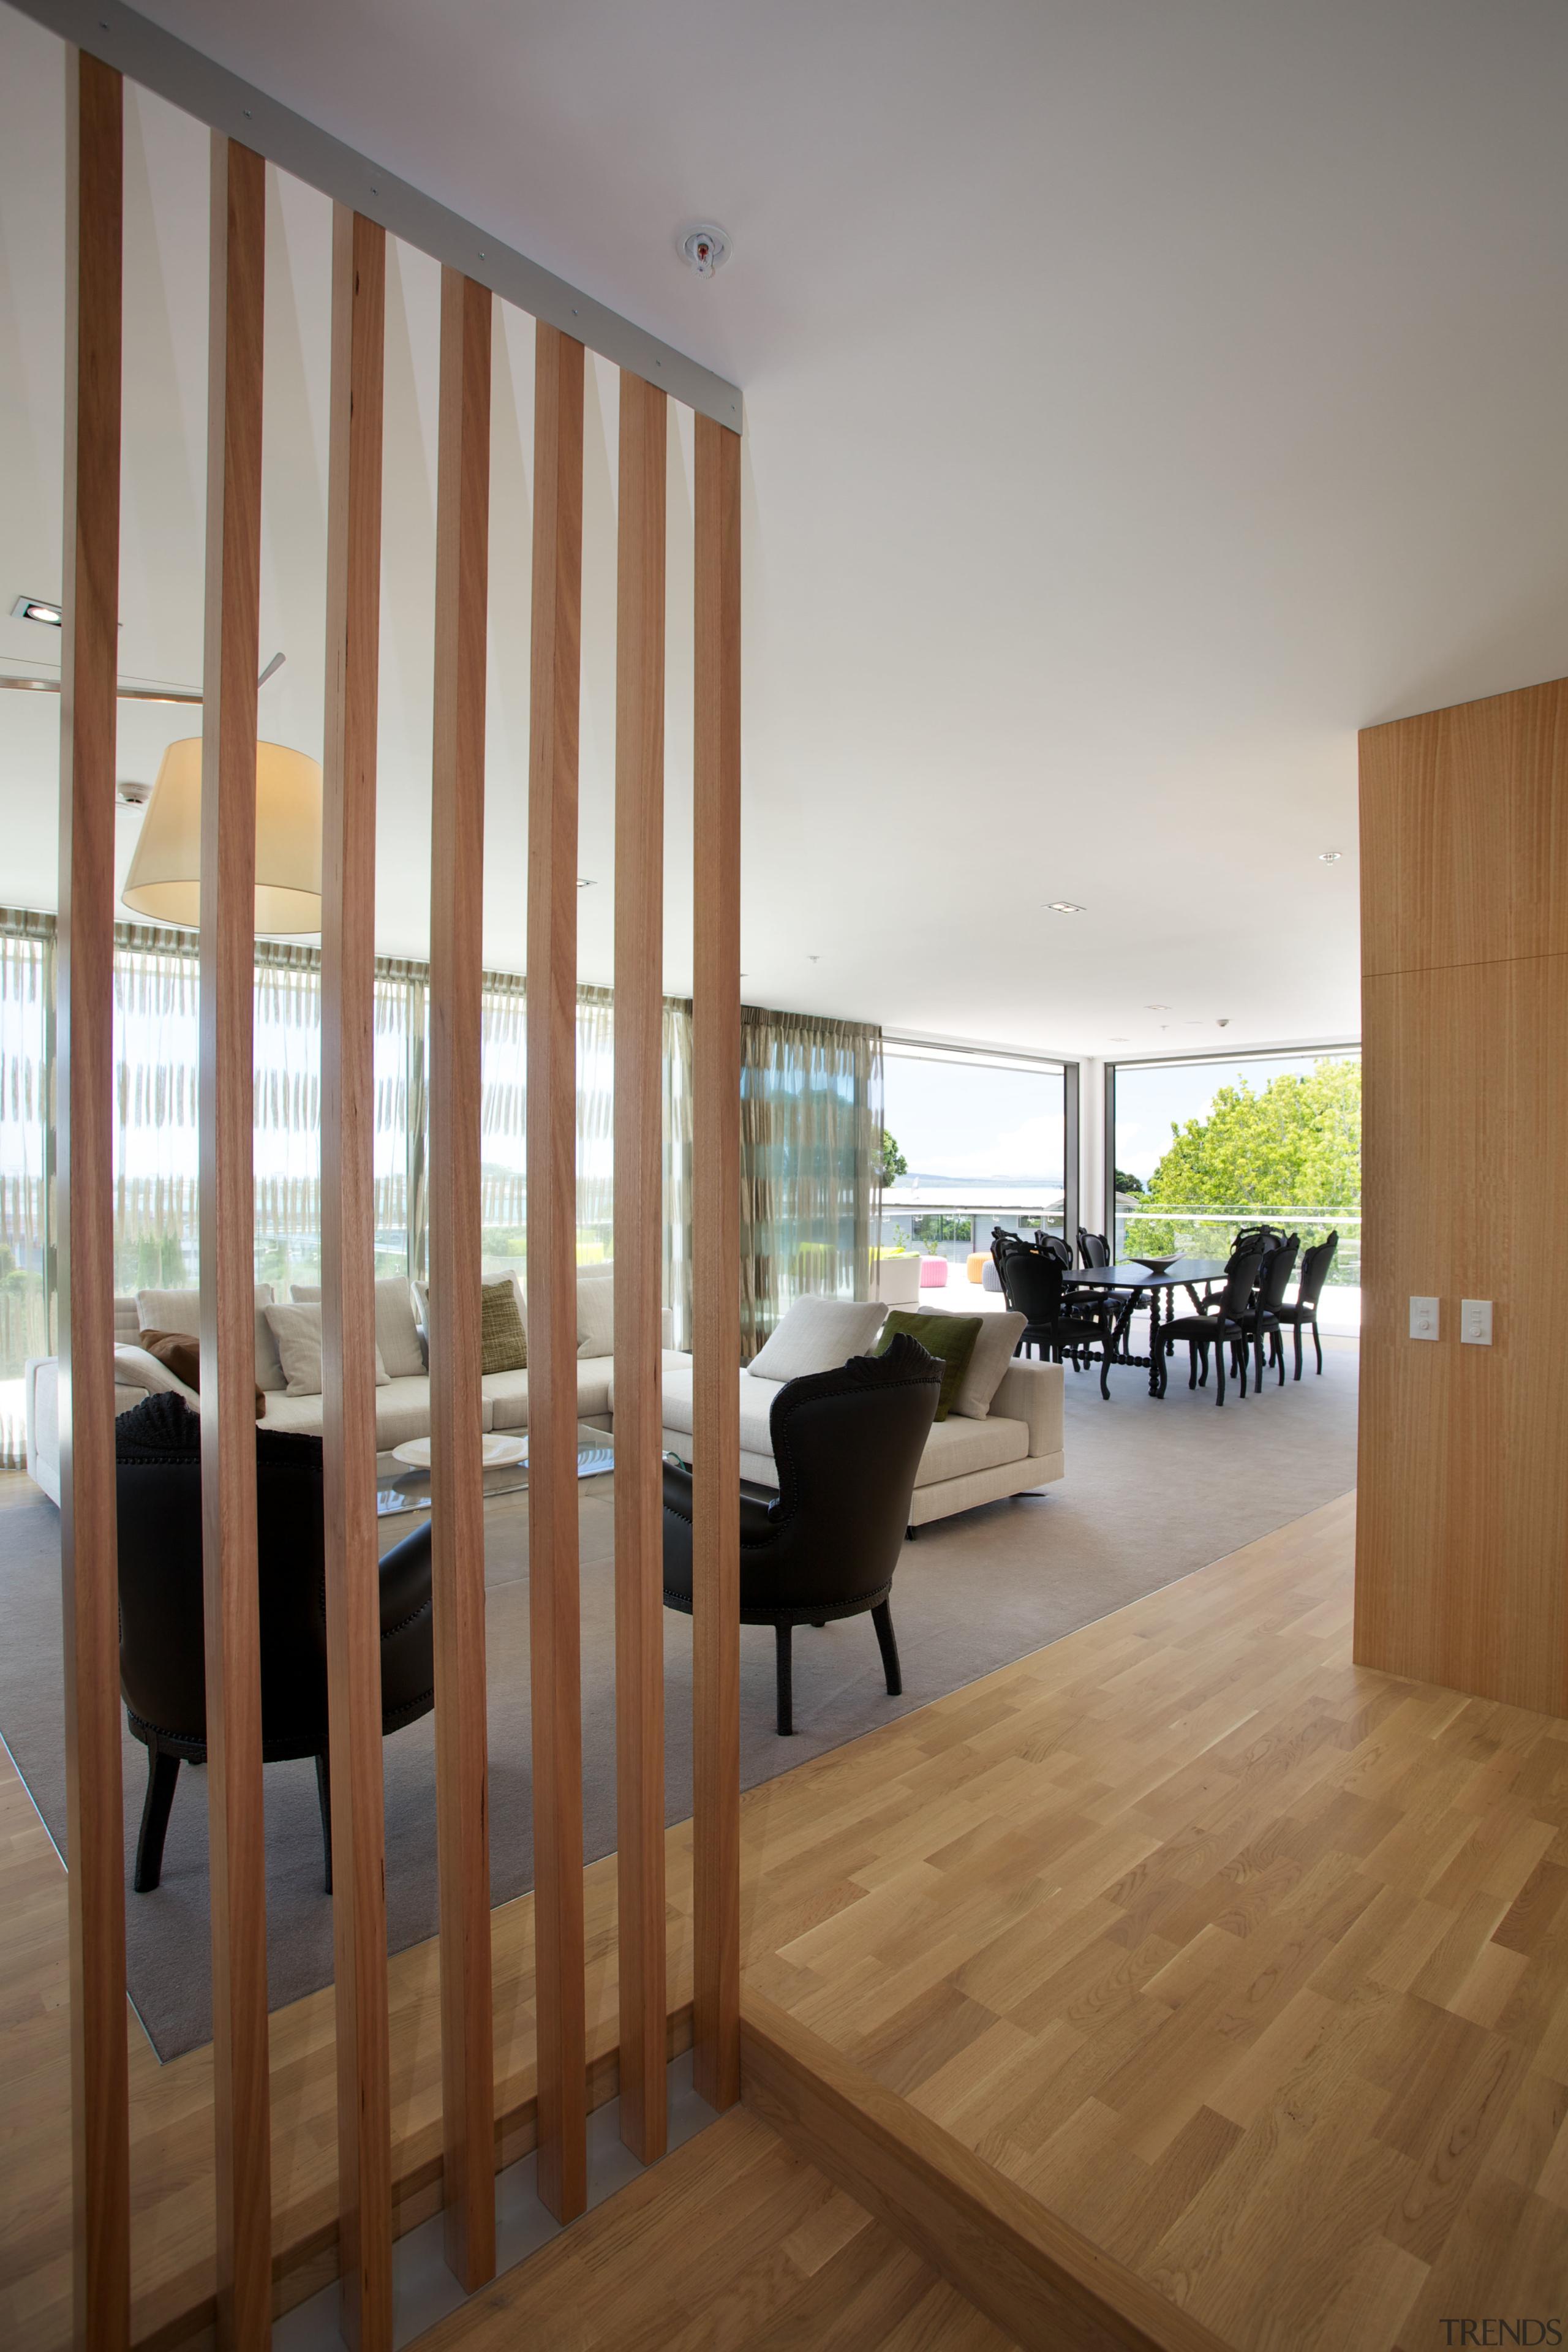 Tall timber slats define the entry to this apartment, architecture, daylighting, door, floor, flooring, hardwood, house, interior design, laminate flooring, wall, window, wood, wood flooring, brown, gray